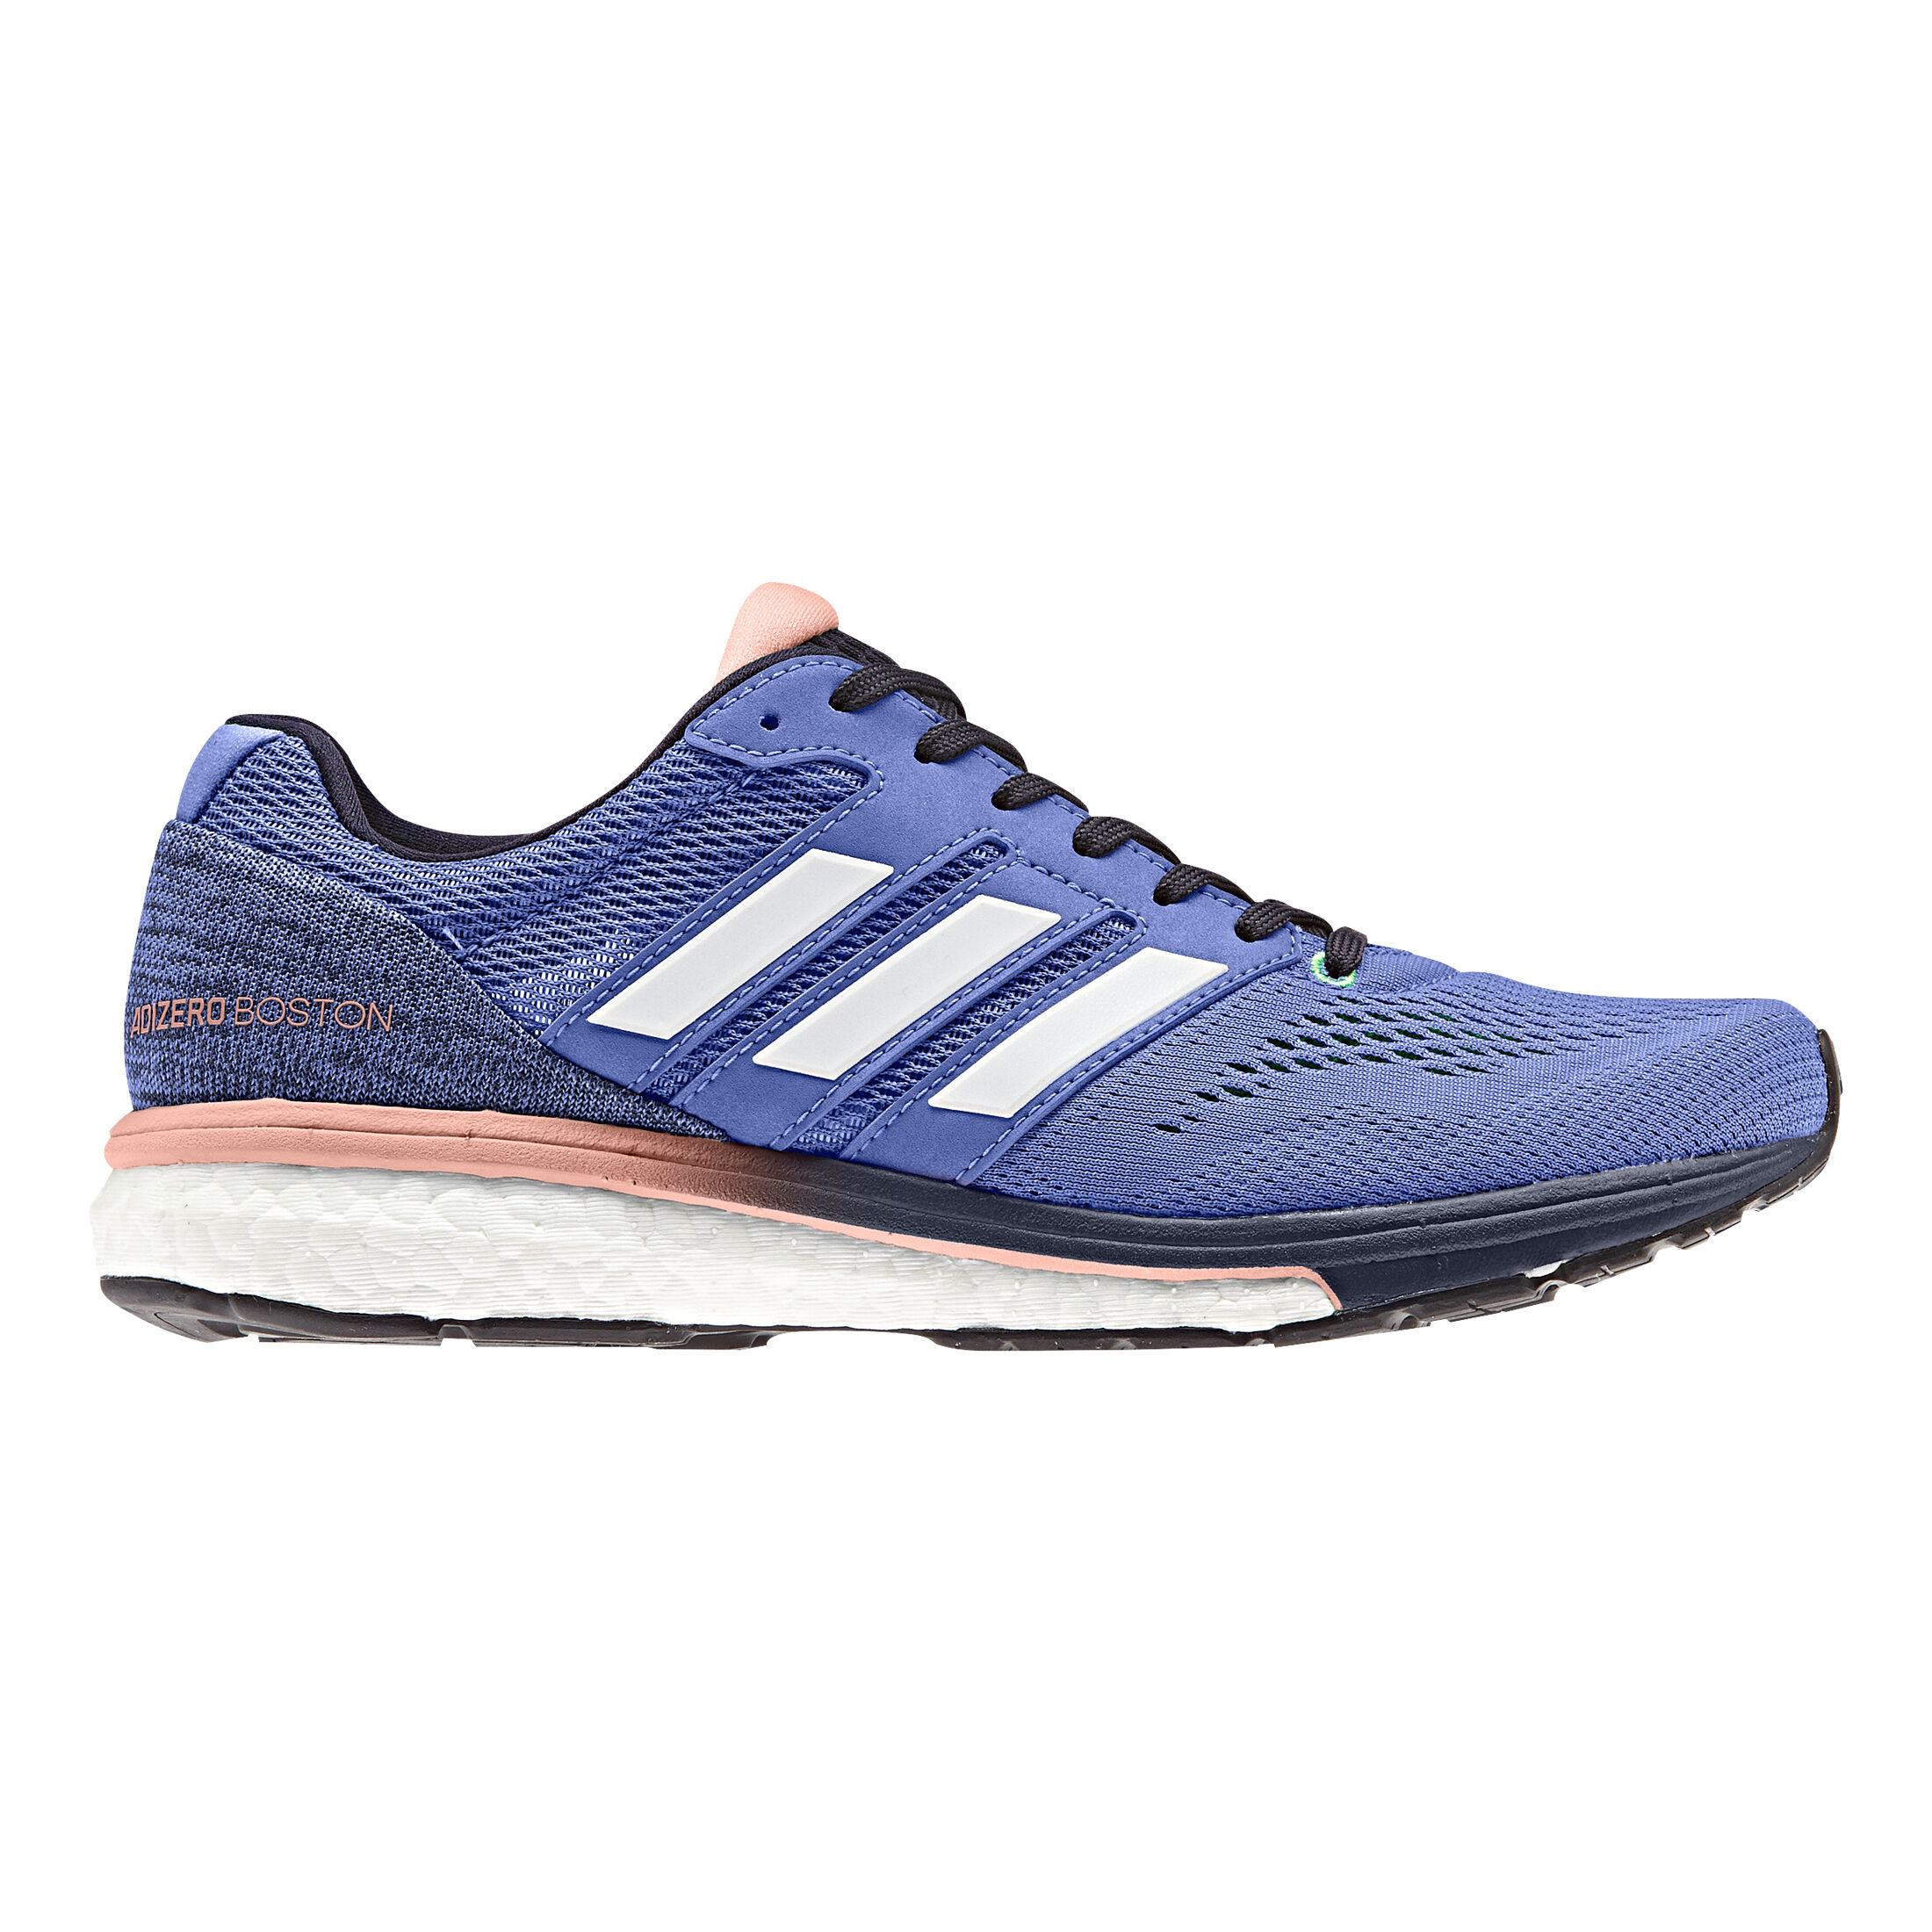 adidas Damen Adizero Boston Boost 6 Neutral Laufschuhe Hellblau